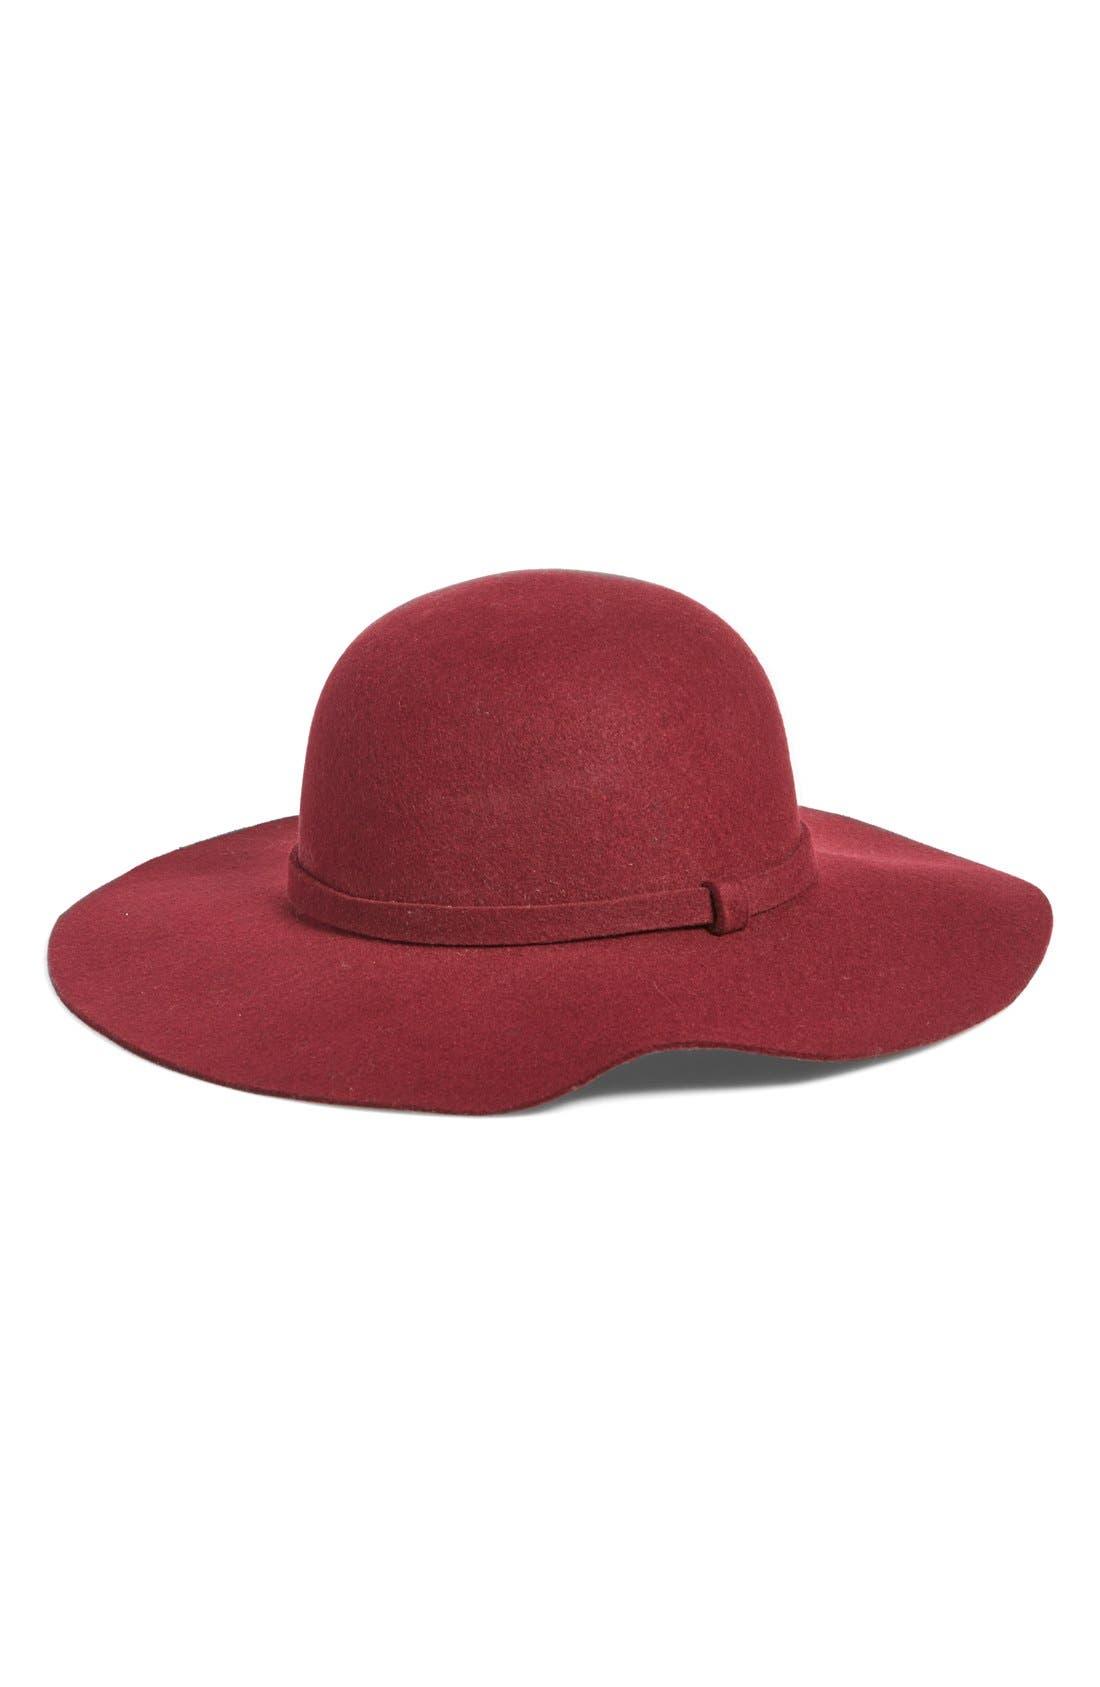 Alternate Image 2  - Phase 3 Floppy Wool Hat